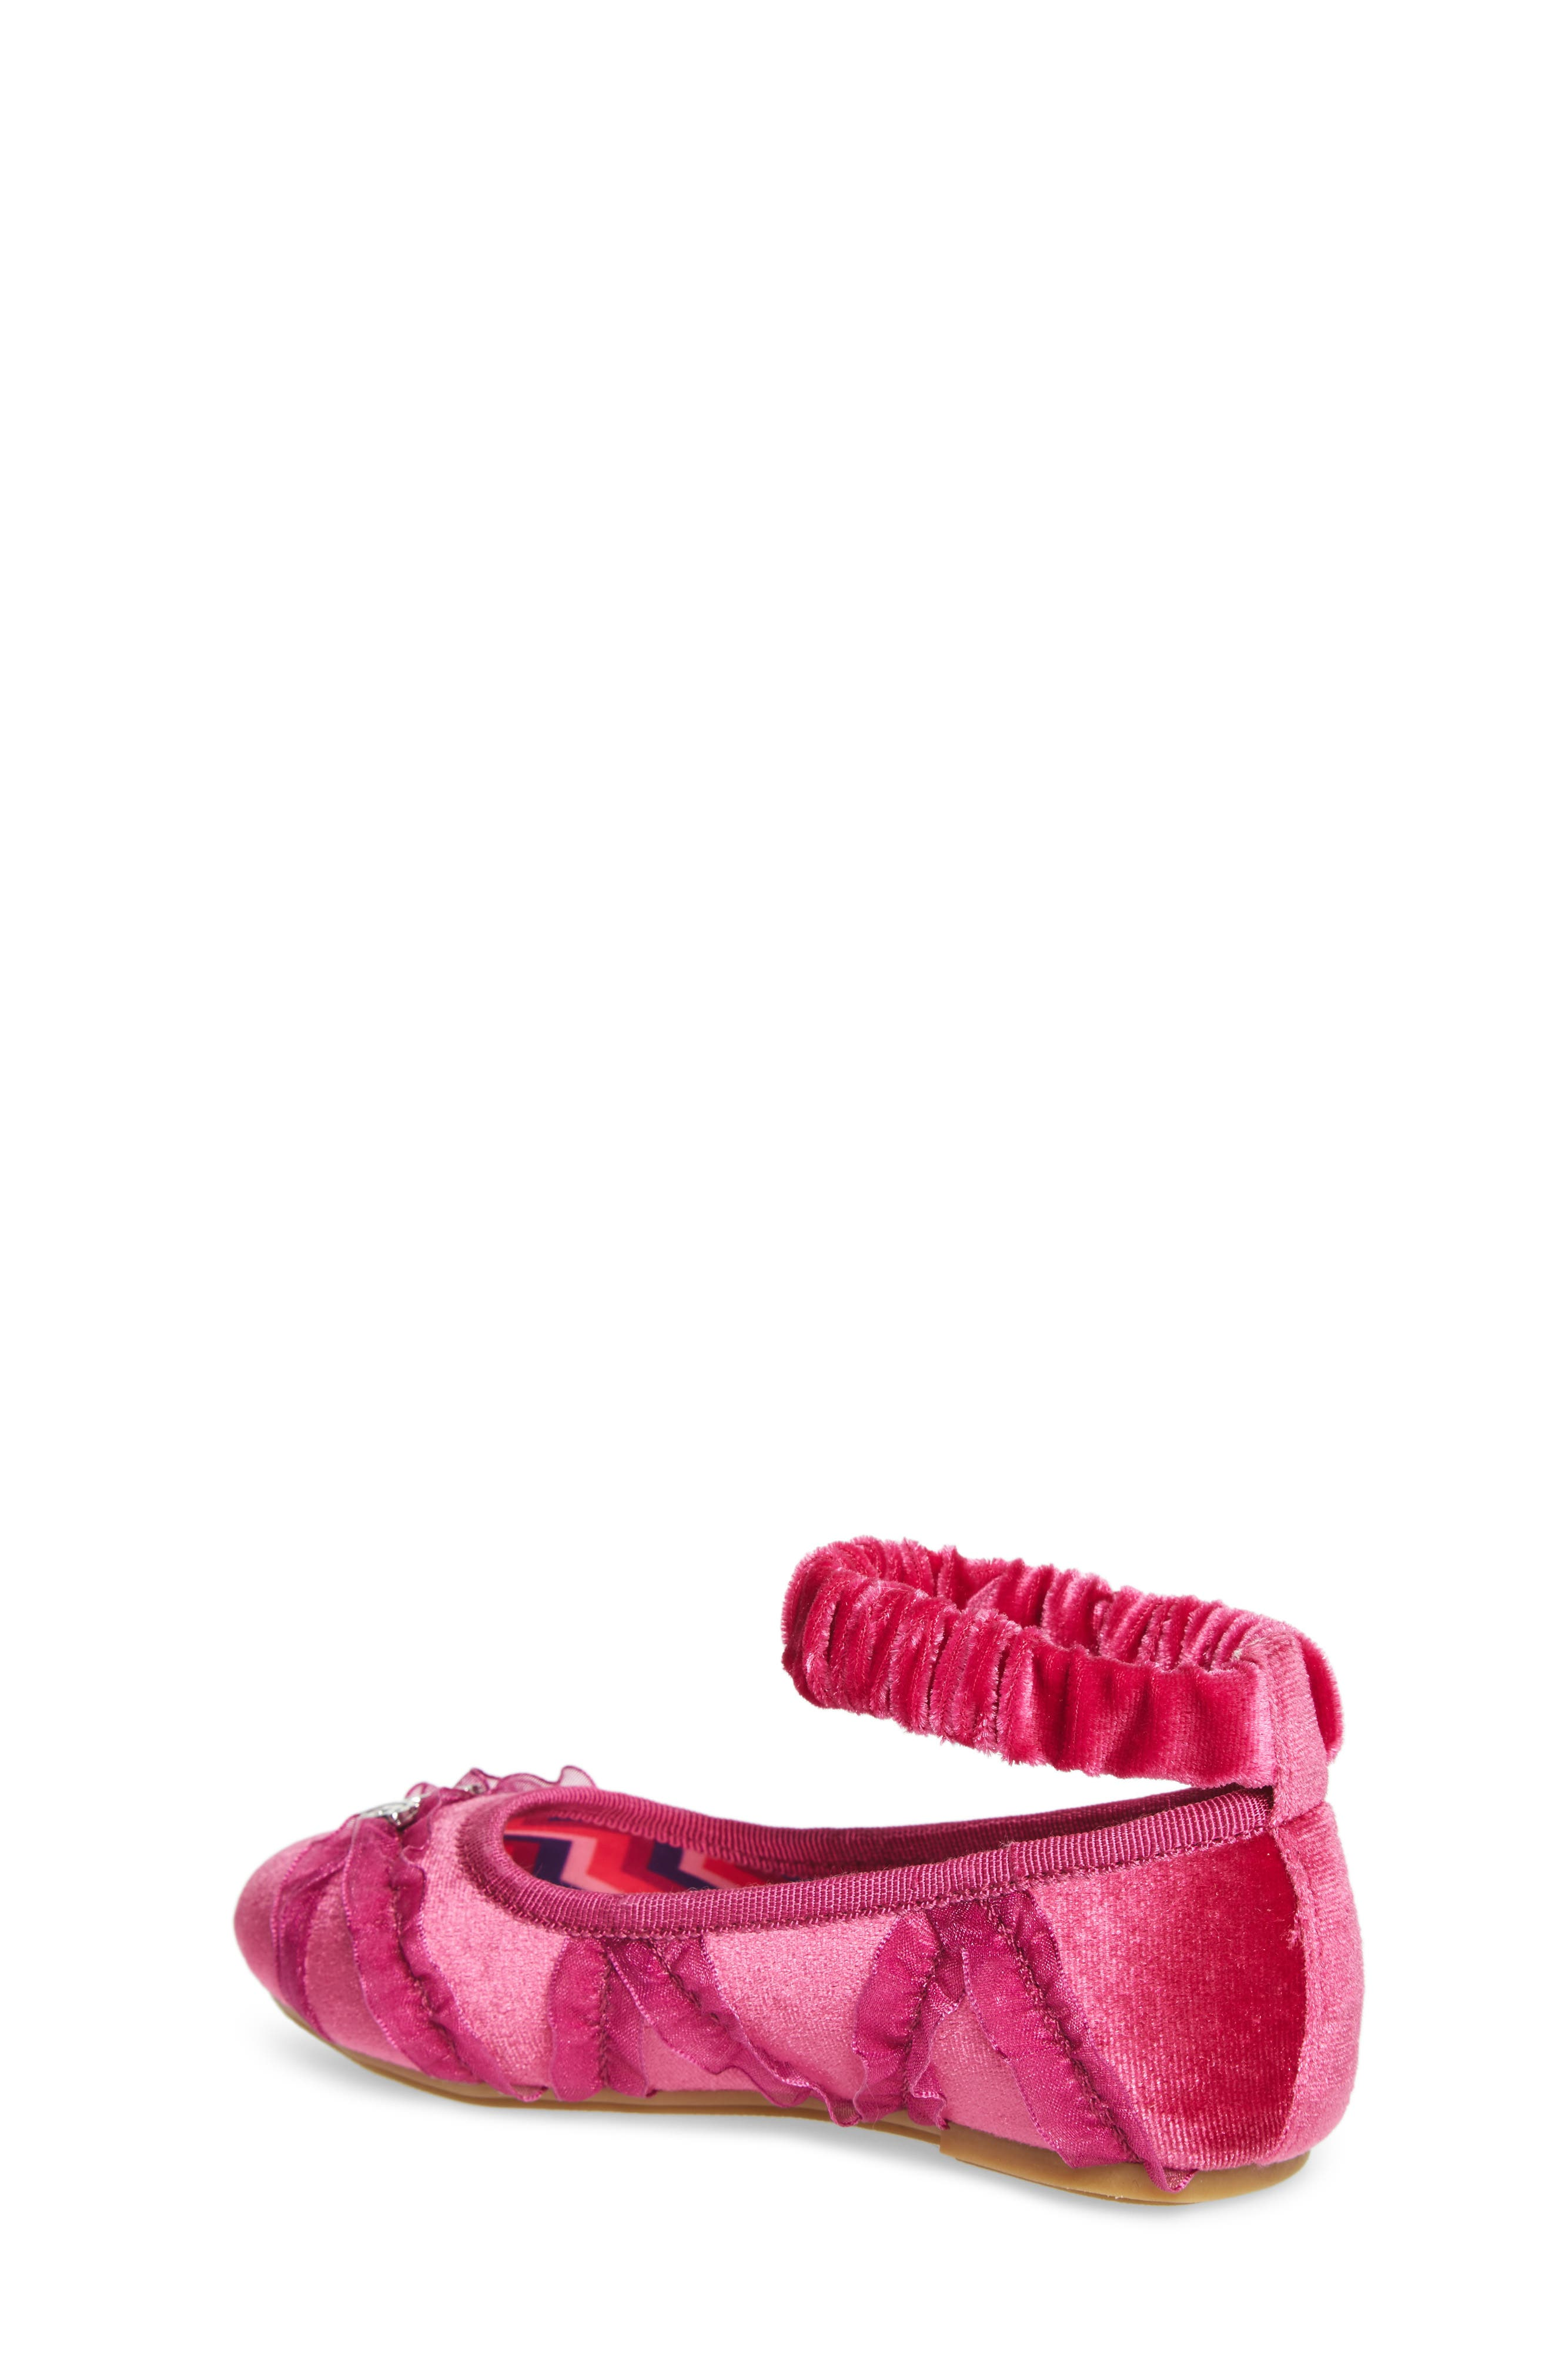 Emerson Ankle Strap Ballet Flat,                             Alternate thumbnail 2, color,